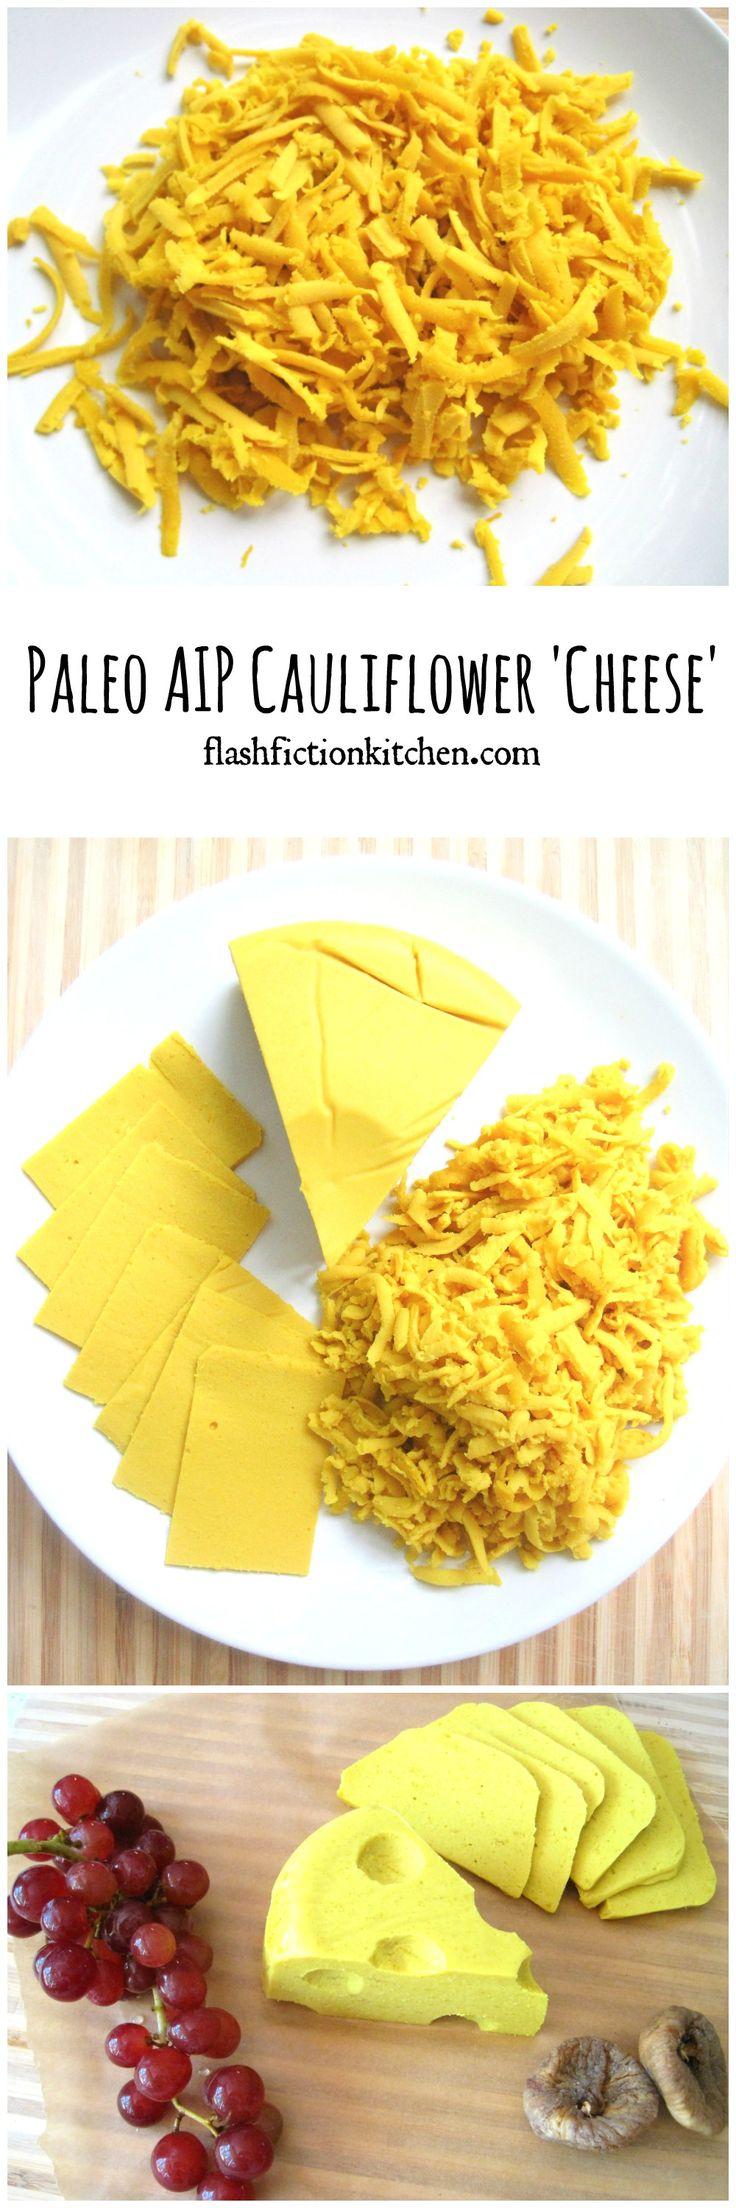 Paleo AIP Cauliflower Cheese from Flash Fiction Kitchen (dairy-free)